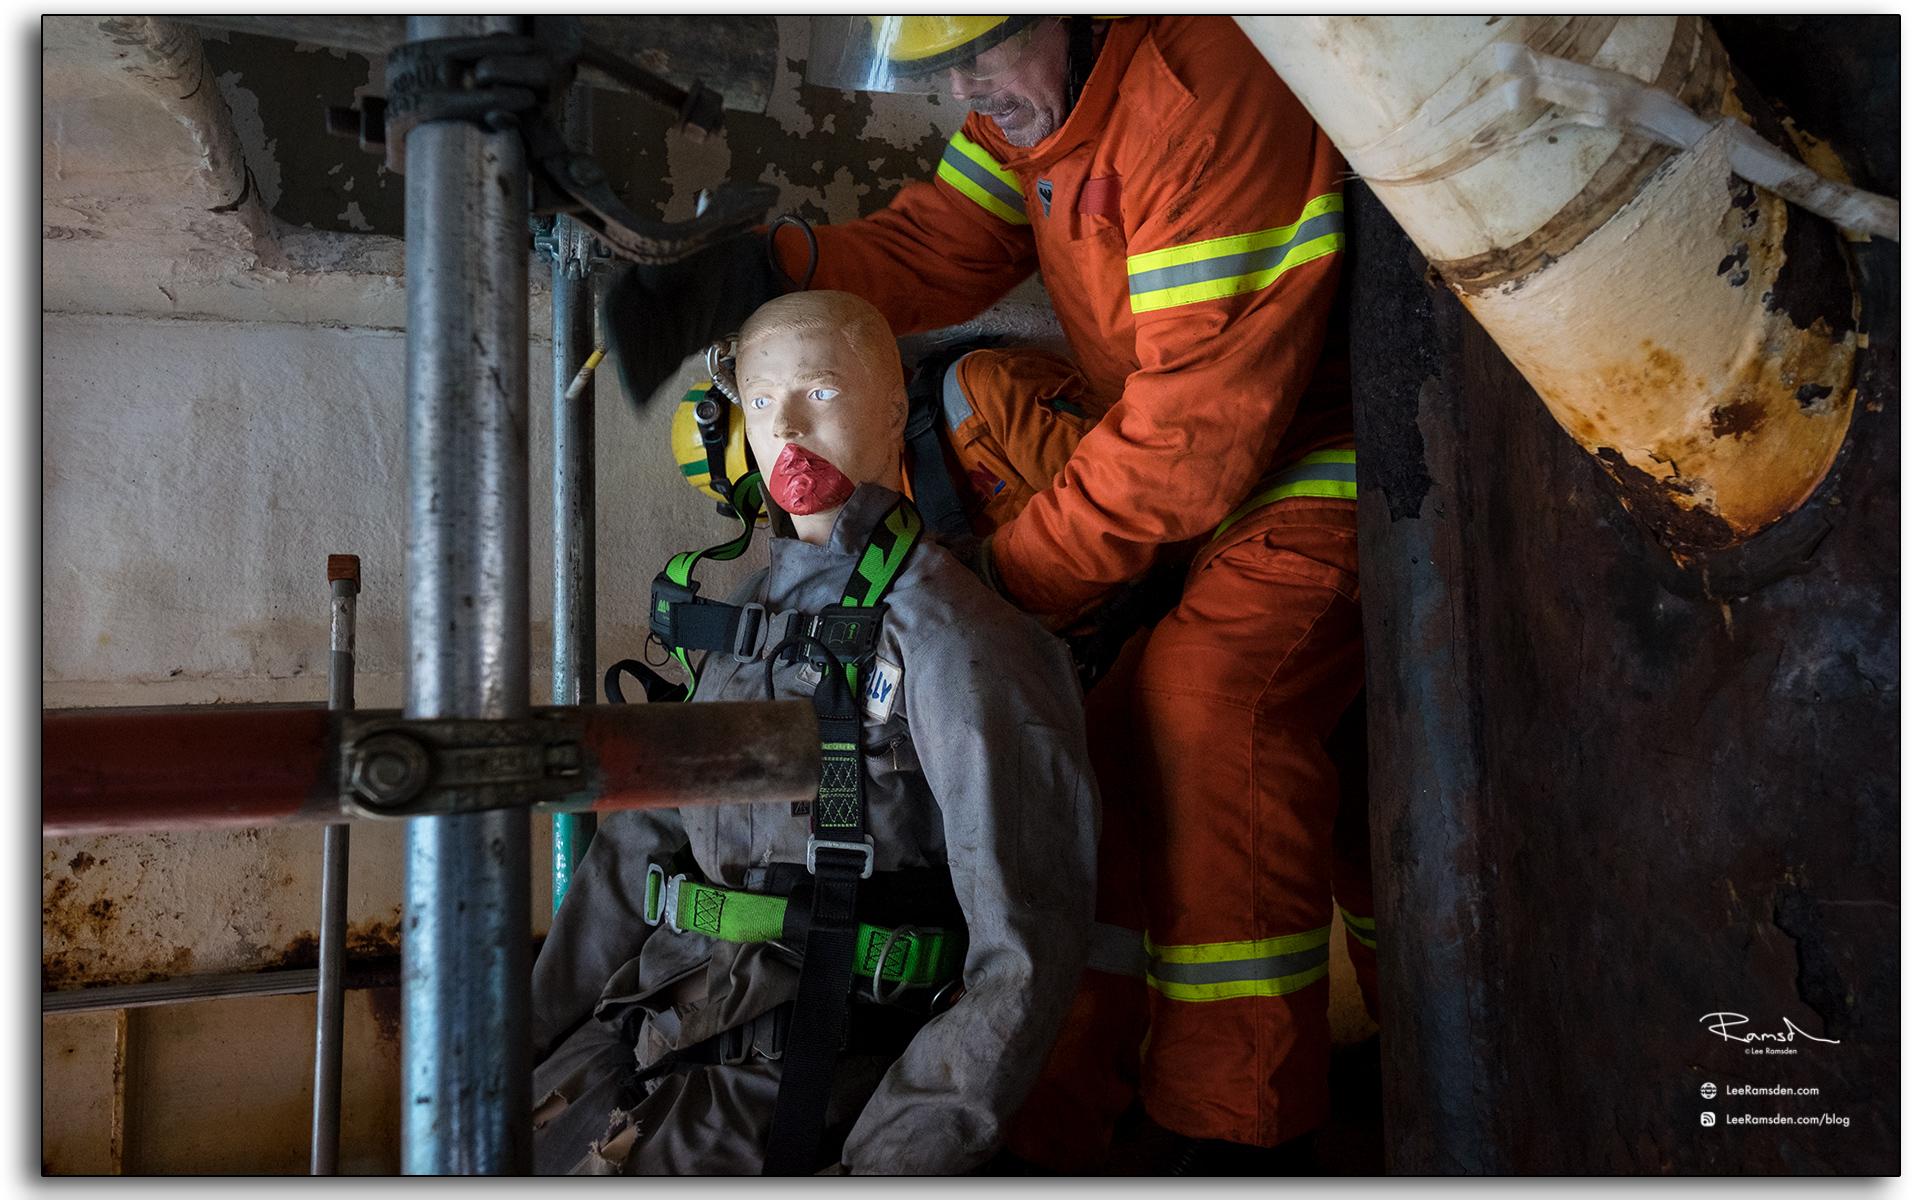 fire man, moviing casuilty, injured, exercise, practice, industrial photographer.